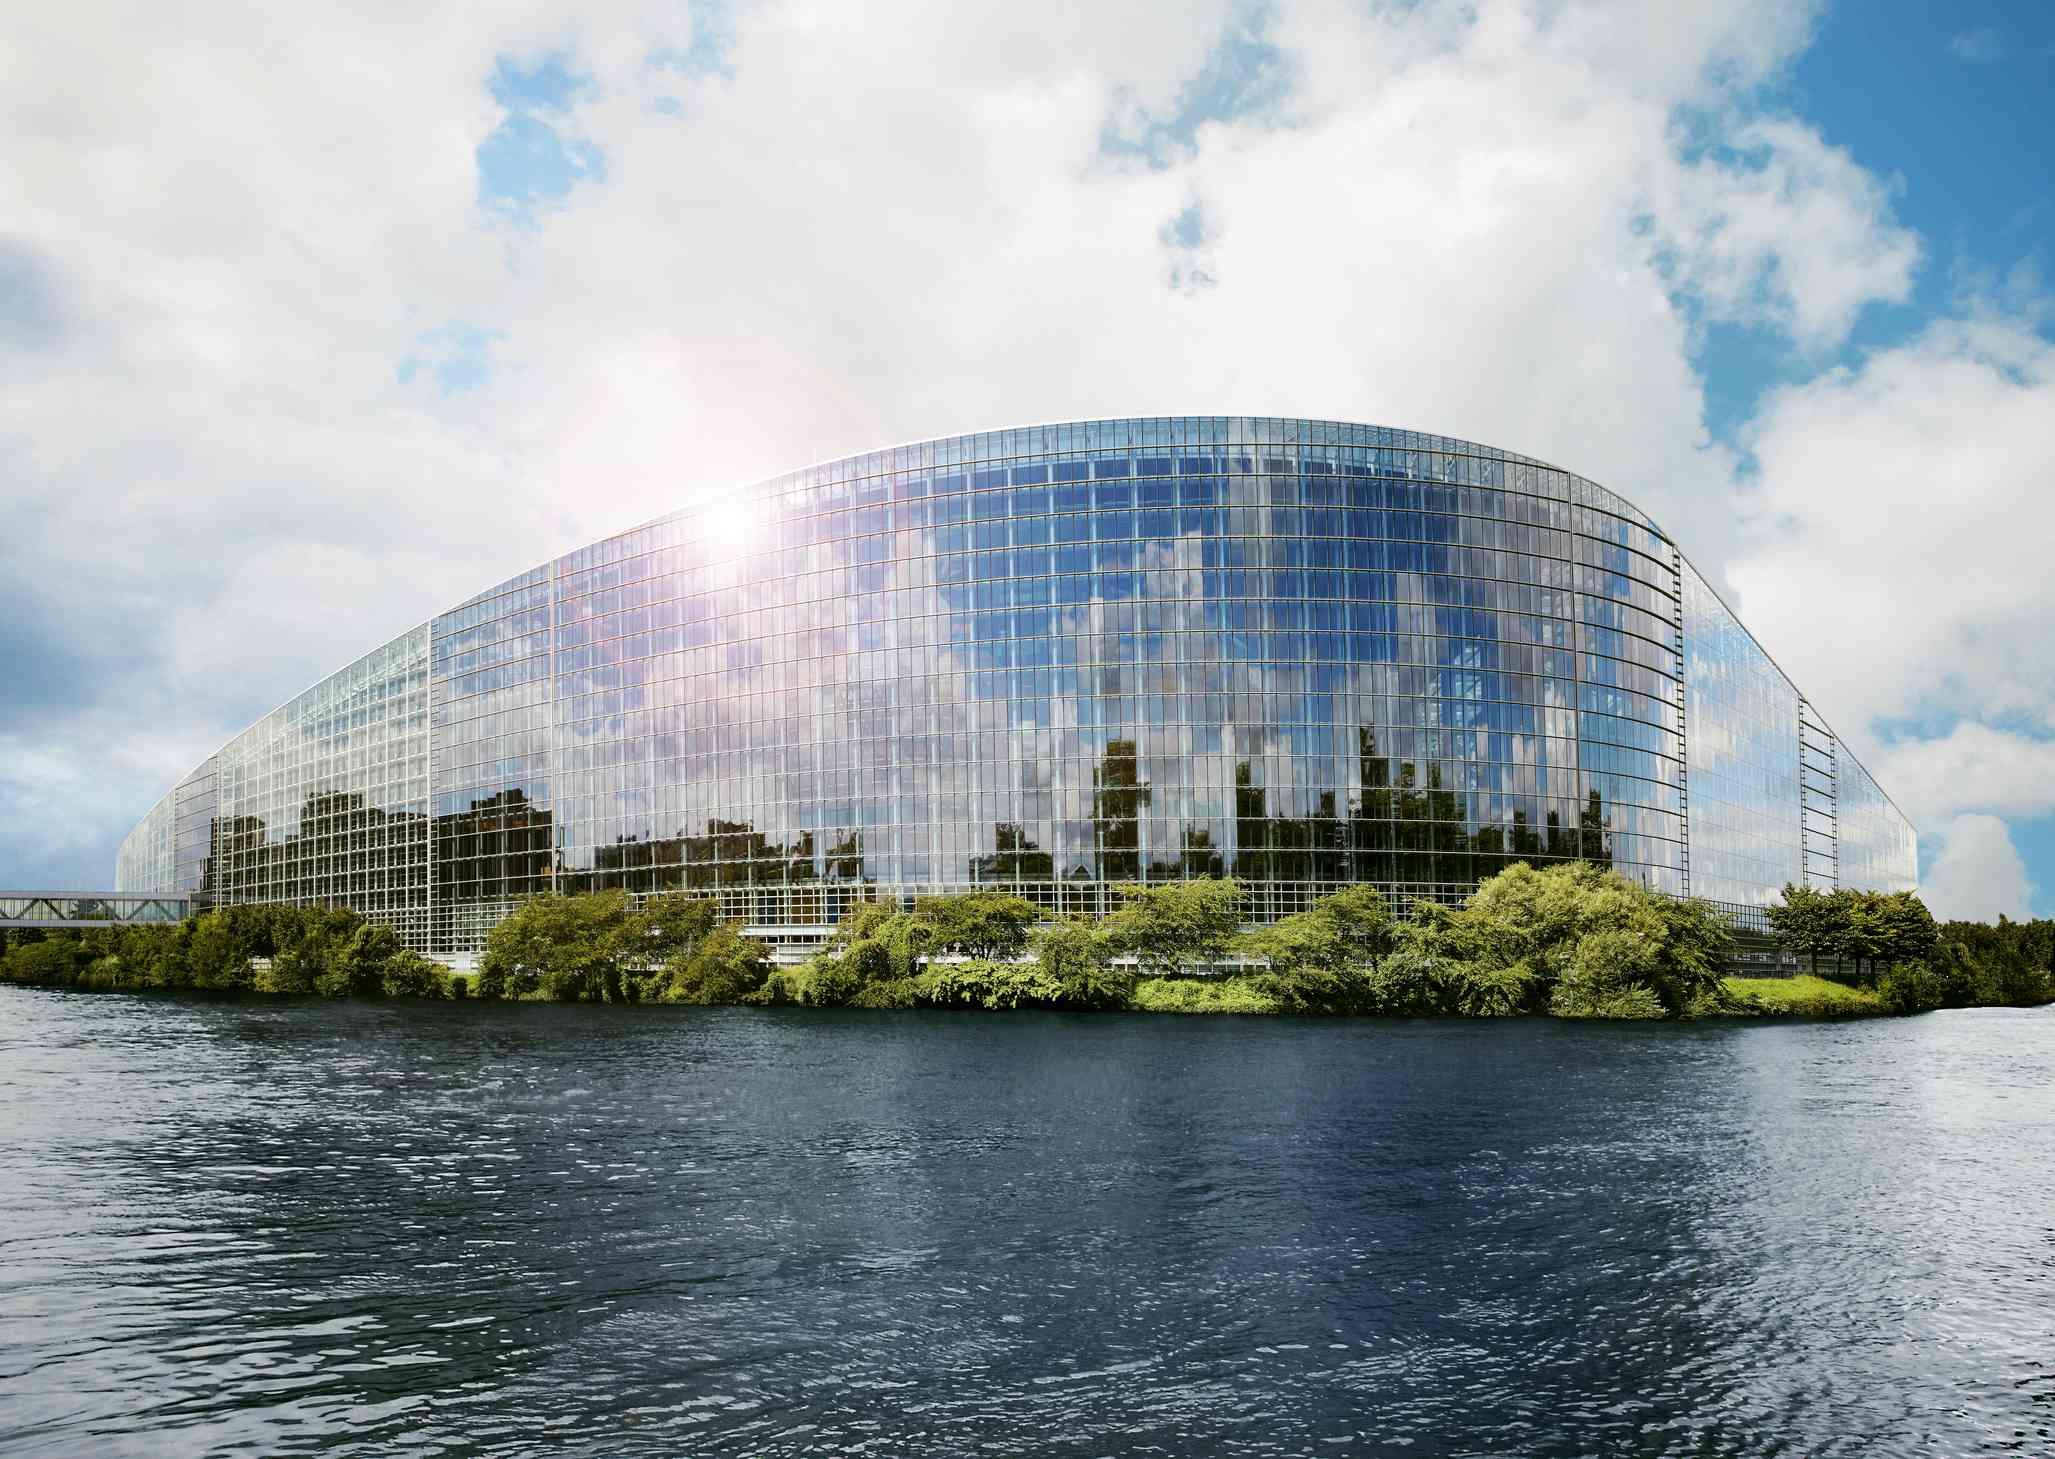 European Parliament in Strasbourg, France